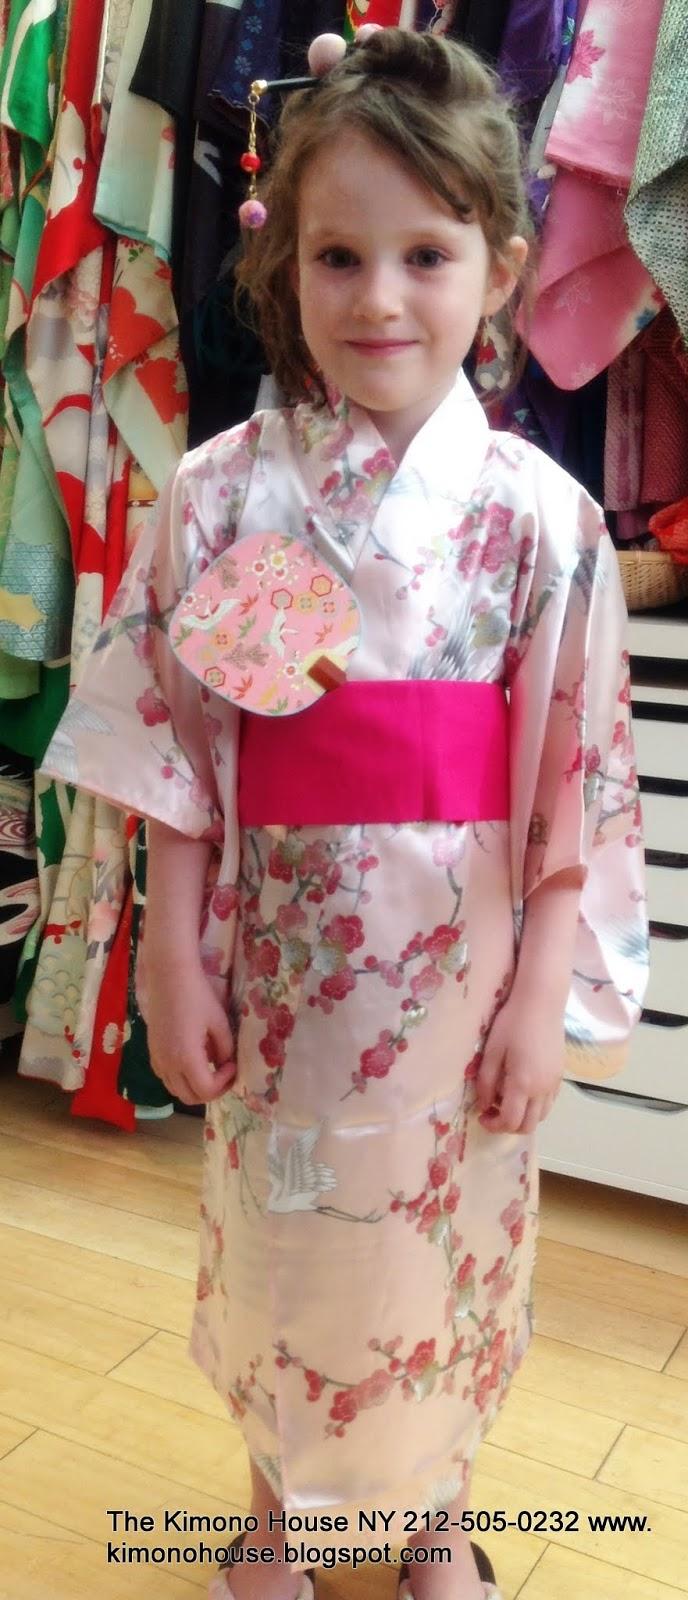 KIMONO HOUSE - NEW YORK Halloween Kimono Costumes that are authentic and from Japan  sc 1 st  kimono house & KIMONO HOUSE - NEW YORK: Halloween Kimono Costumes that are ...